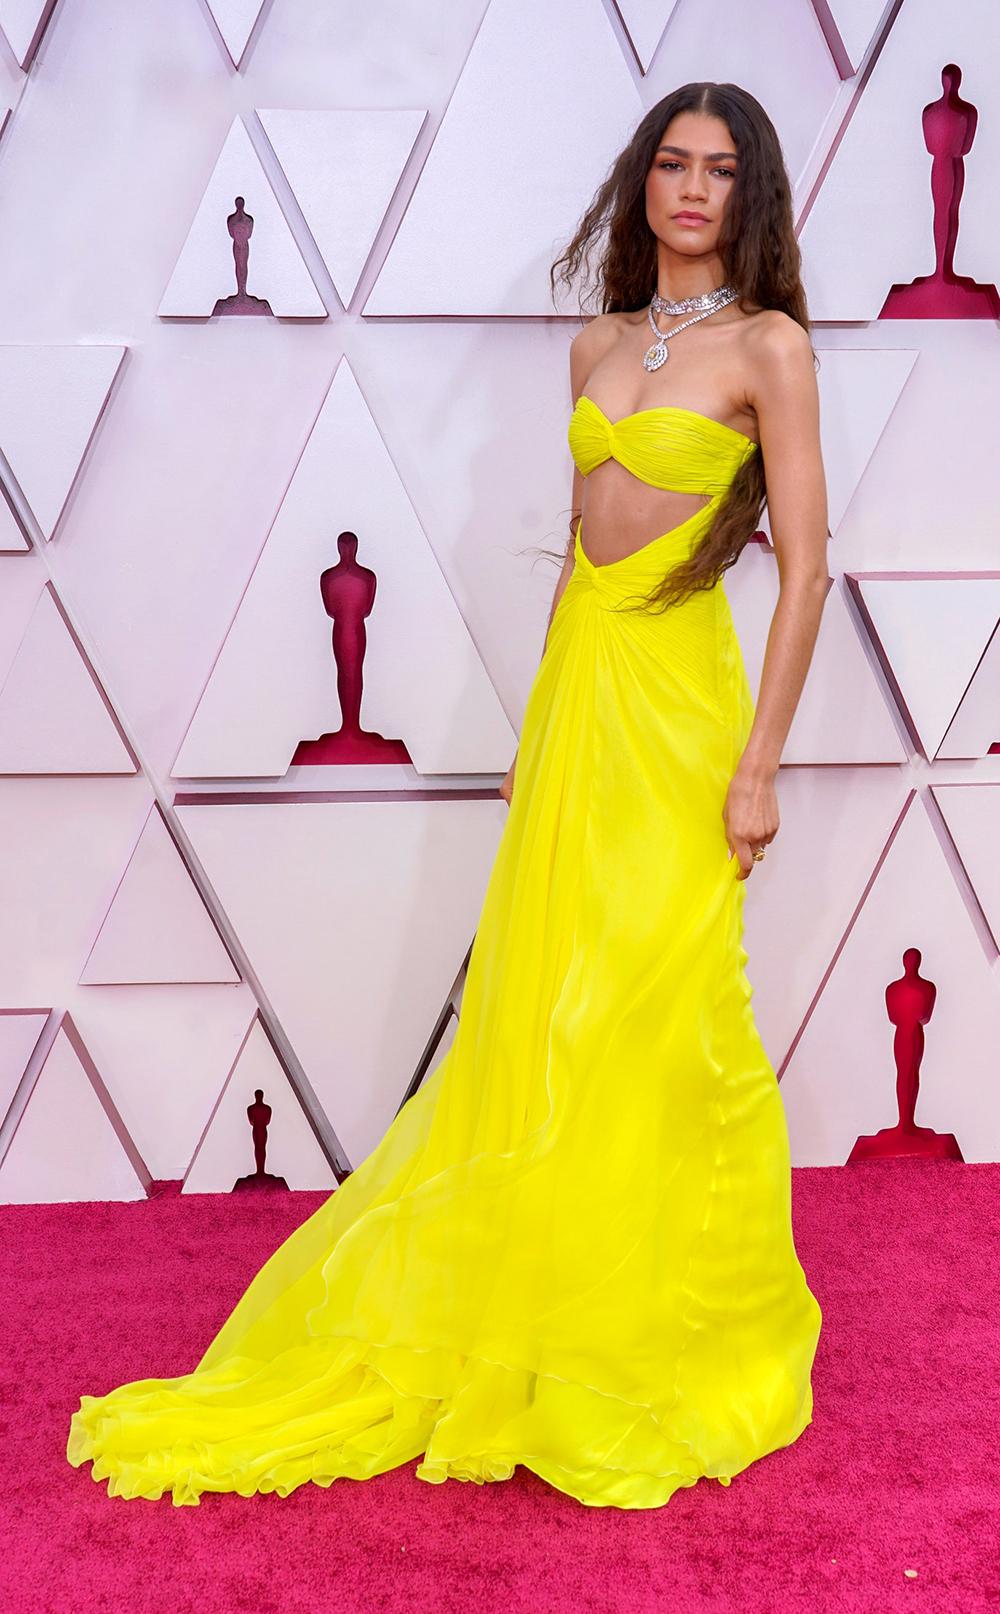 2021 Oscars Fashion I Zendaya in custom Valentino haute couture inspired by Cher #fashionstyle #stylish